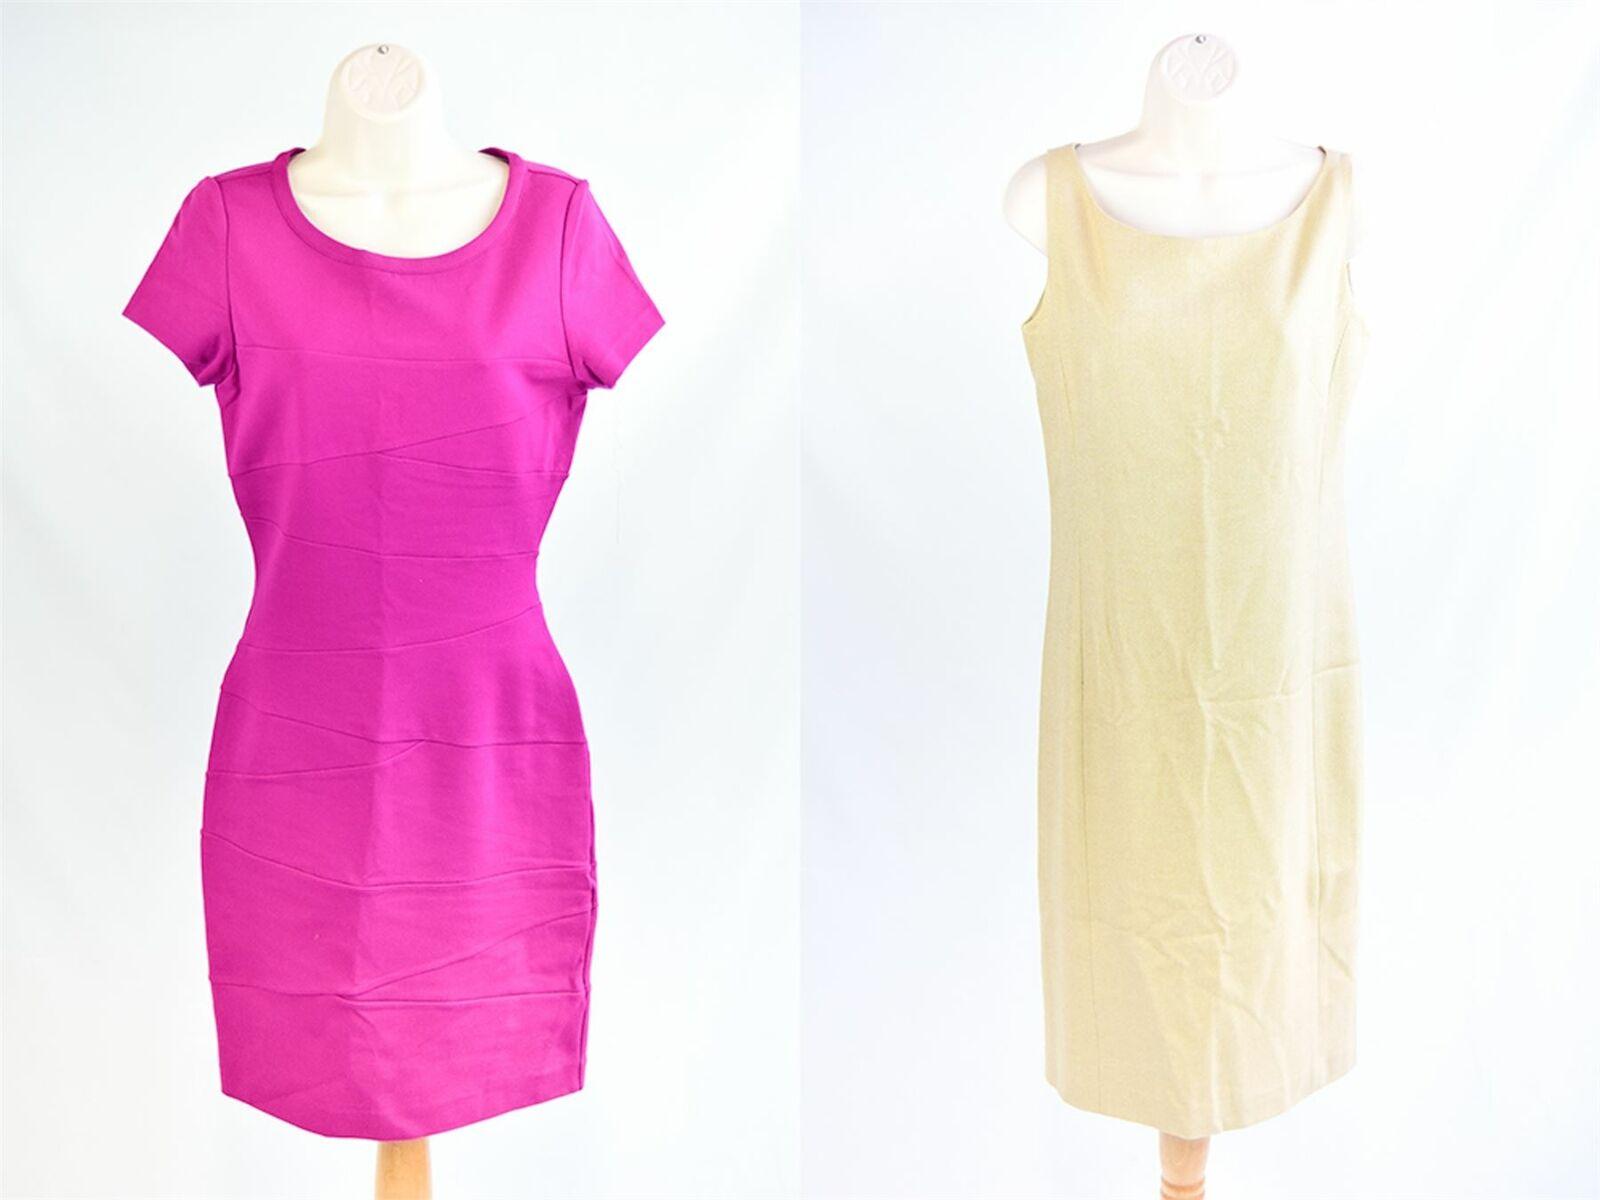 DIANE VON FURSTENBERG AND RALPH LAUREN Dresses x2, UK 12 US 8 EU 40